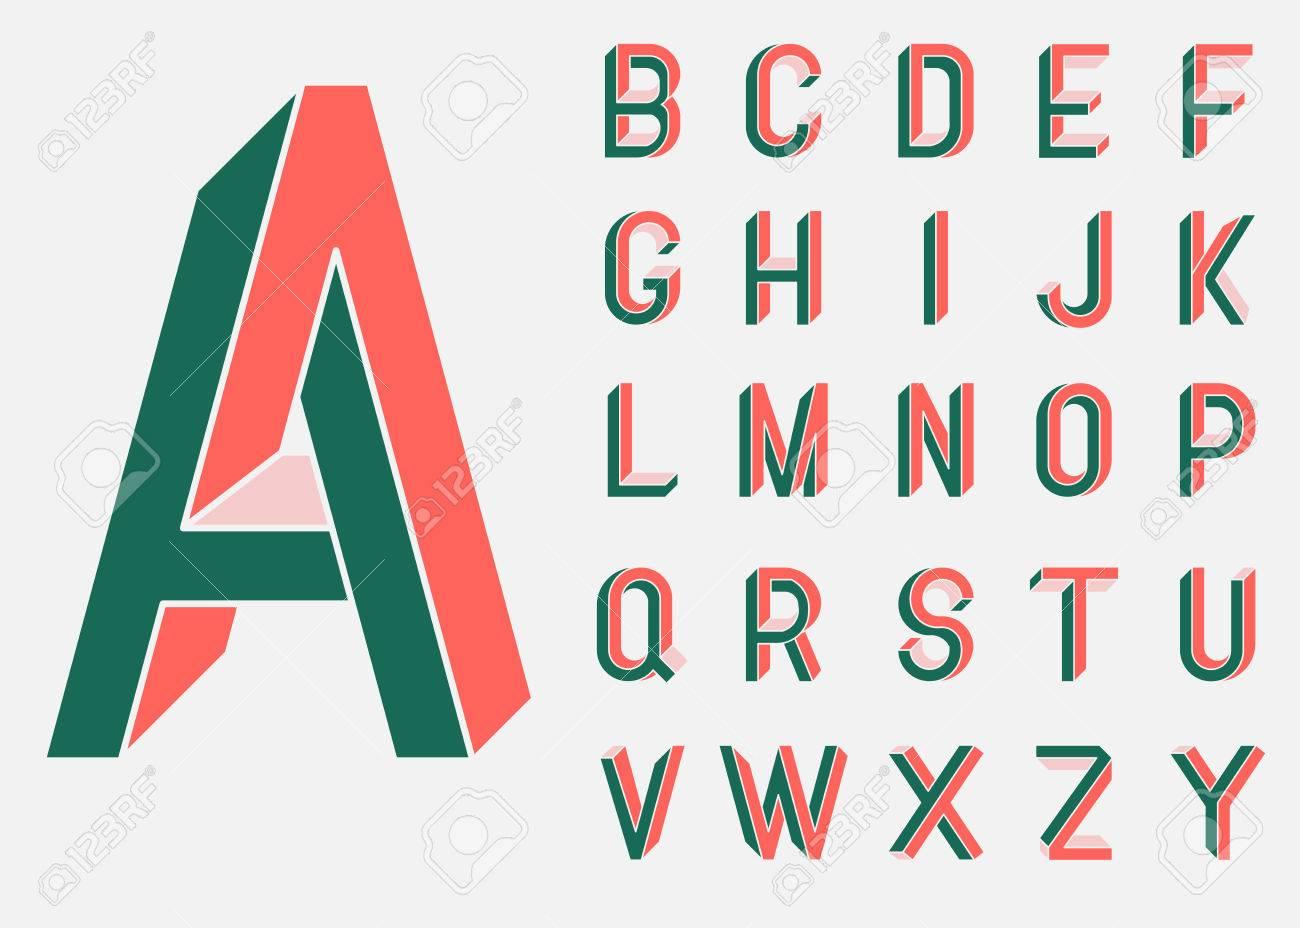 impossible shape font memphis style letters colored letters rh 123rf com vector letter w vector letters grunge